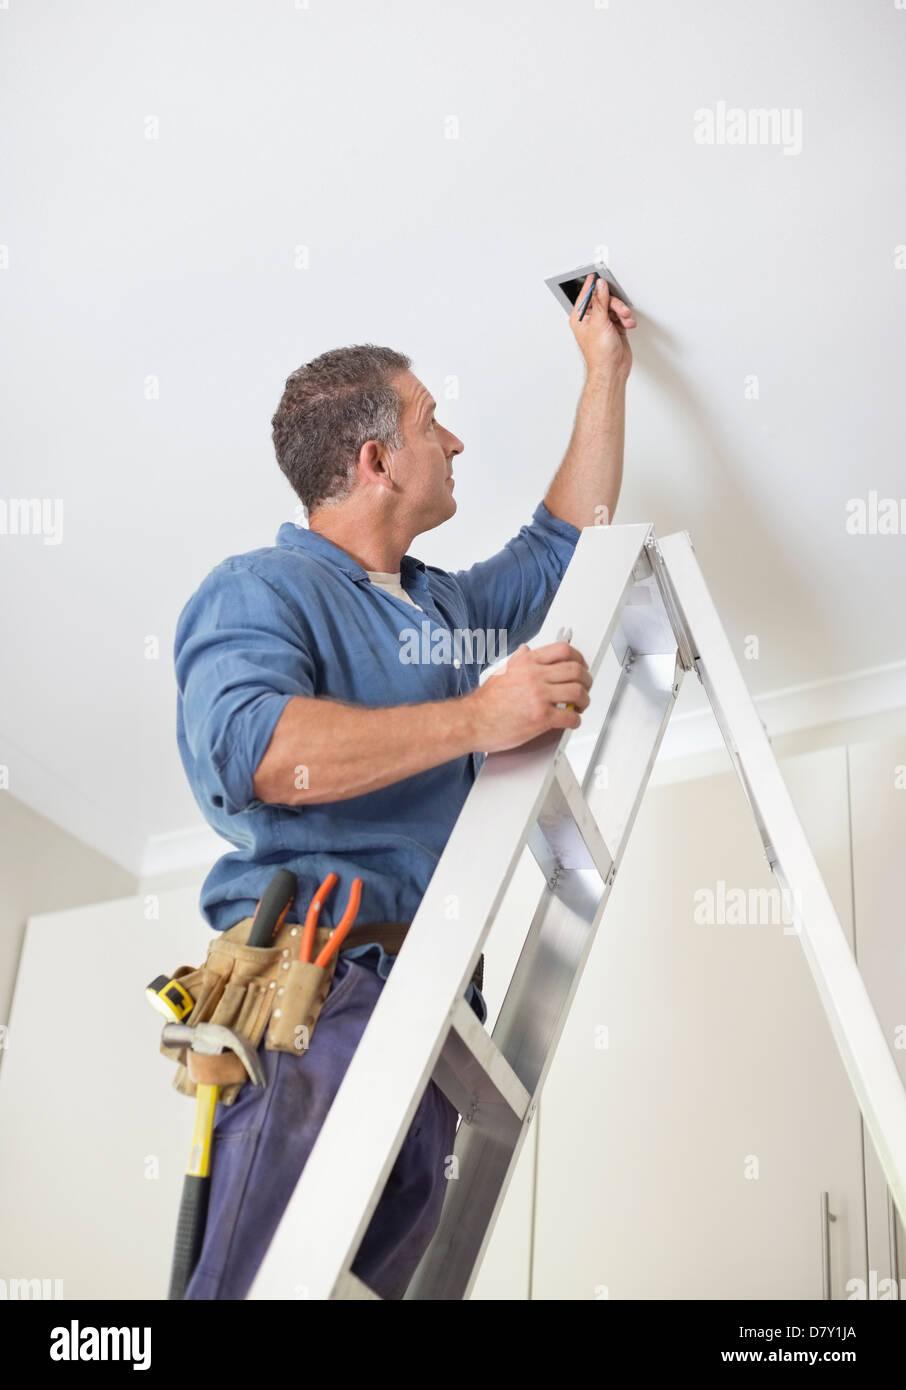 Elektriker arbeiten an Deckenleuchten Stockbild